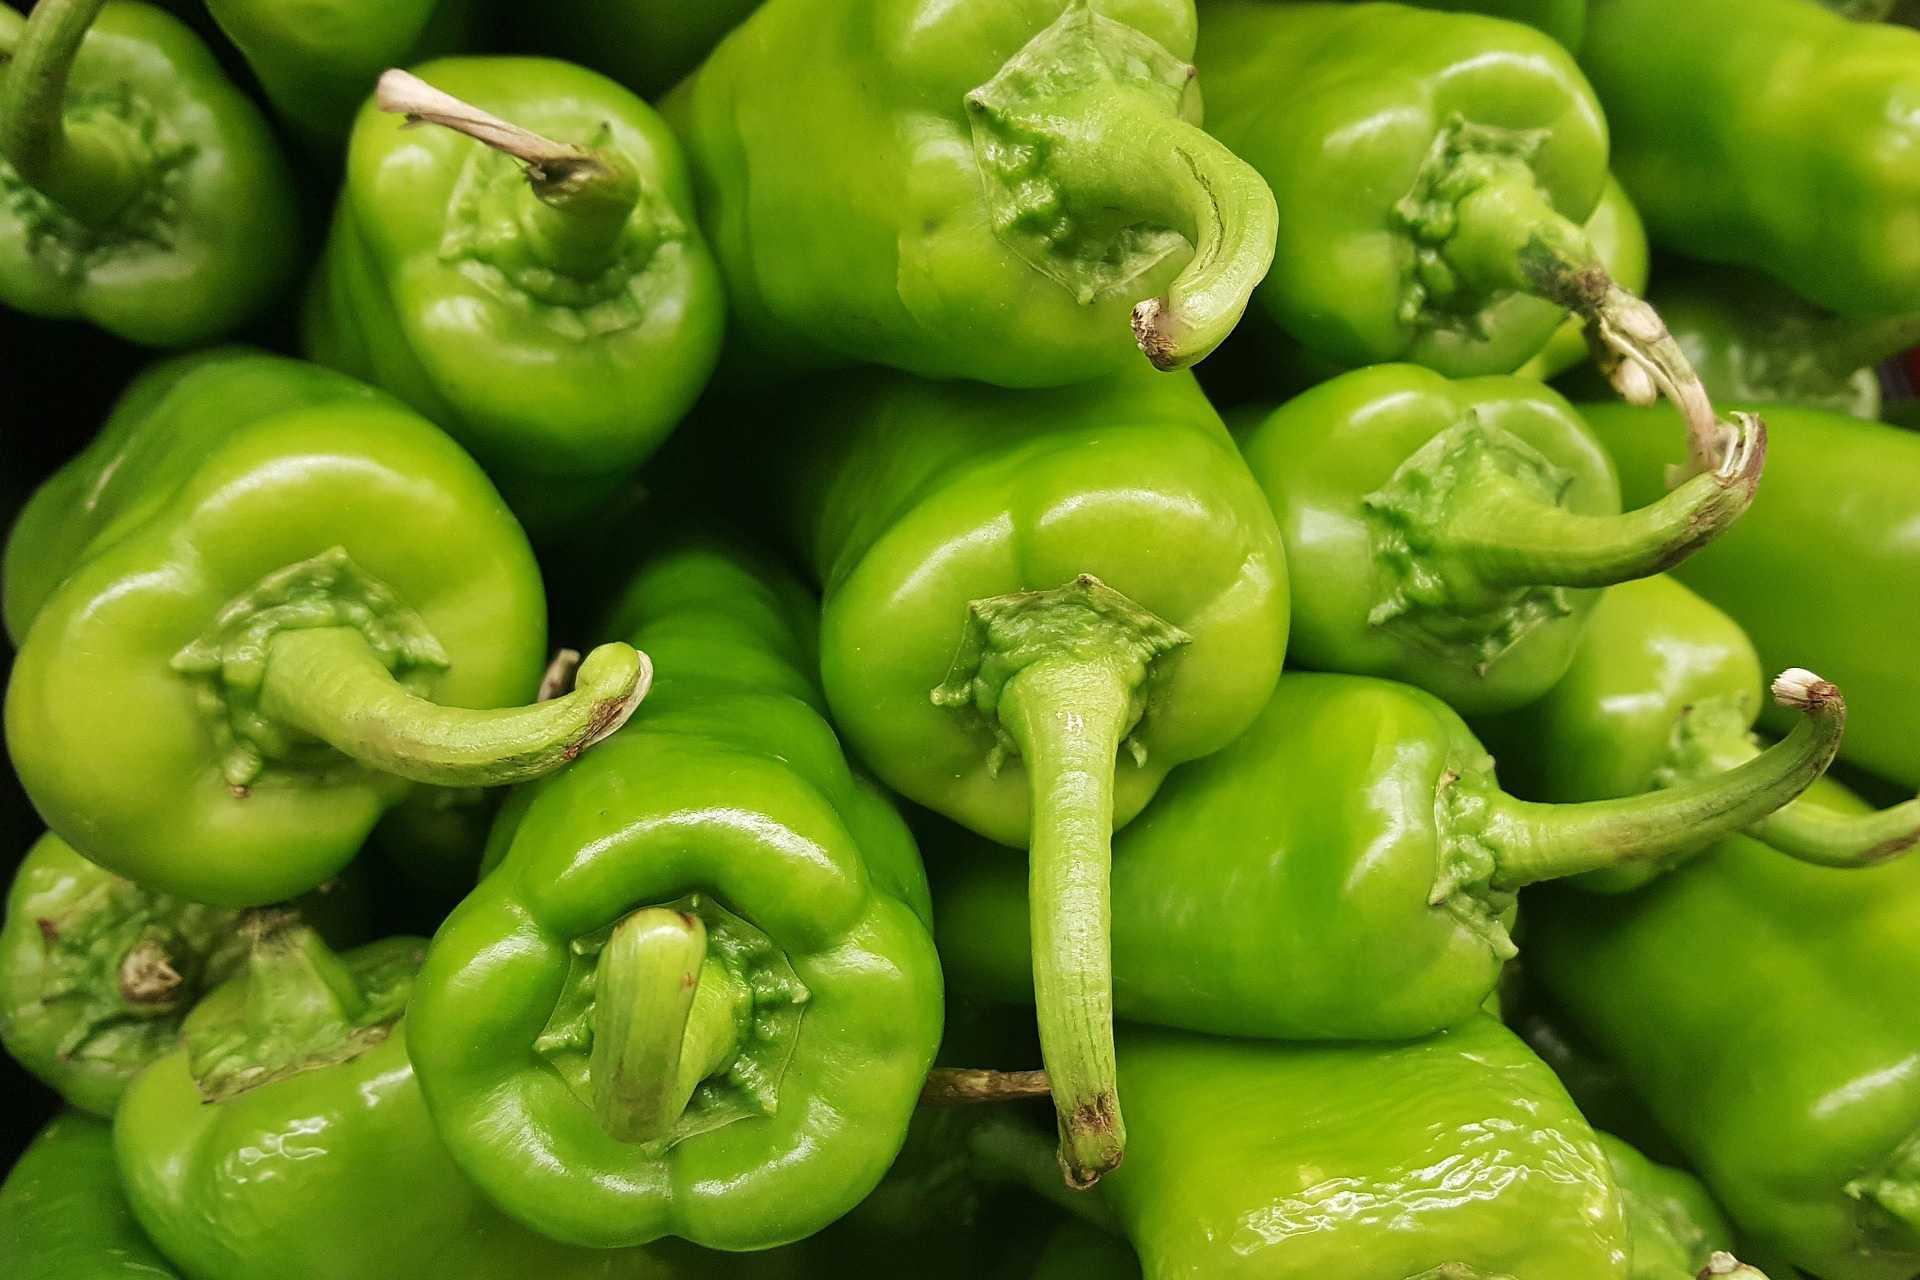 Anaheim pepper